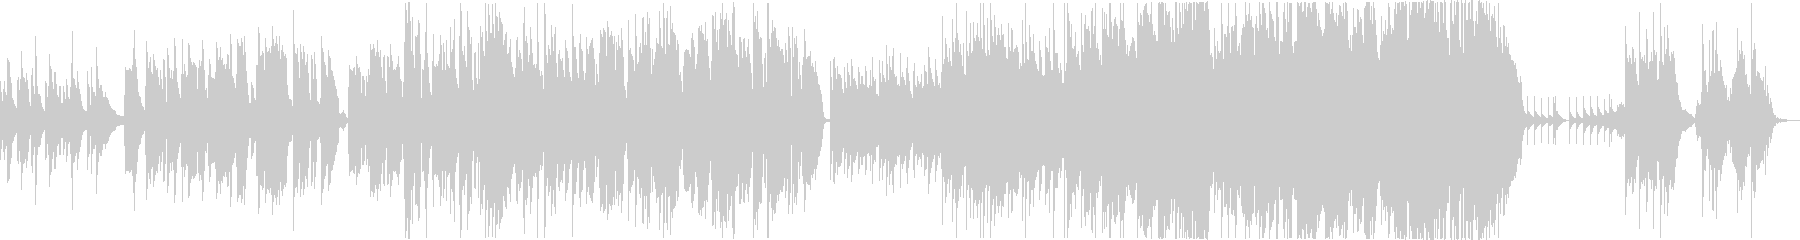 C-POPでリラックスな曲の未再生の波形